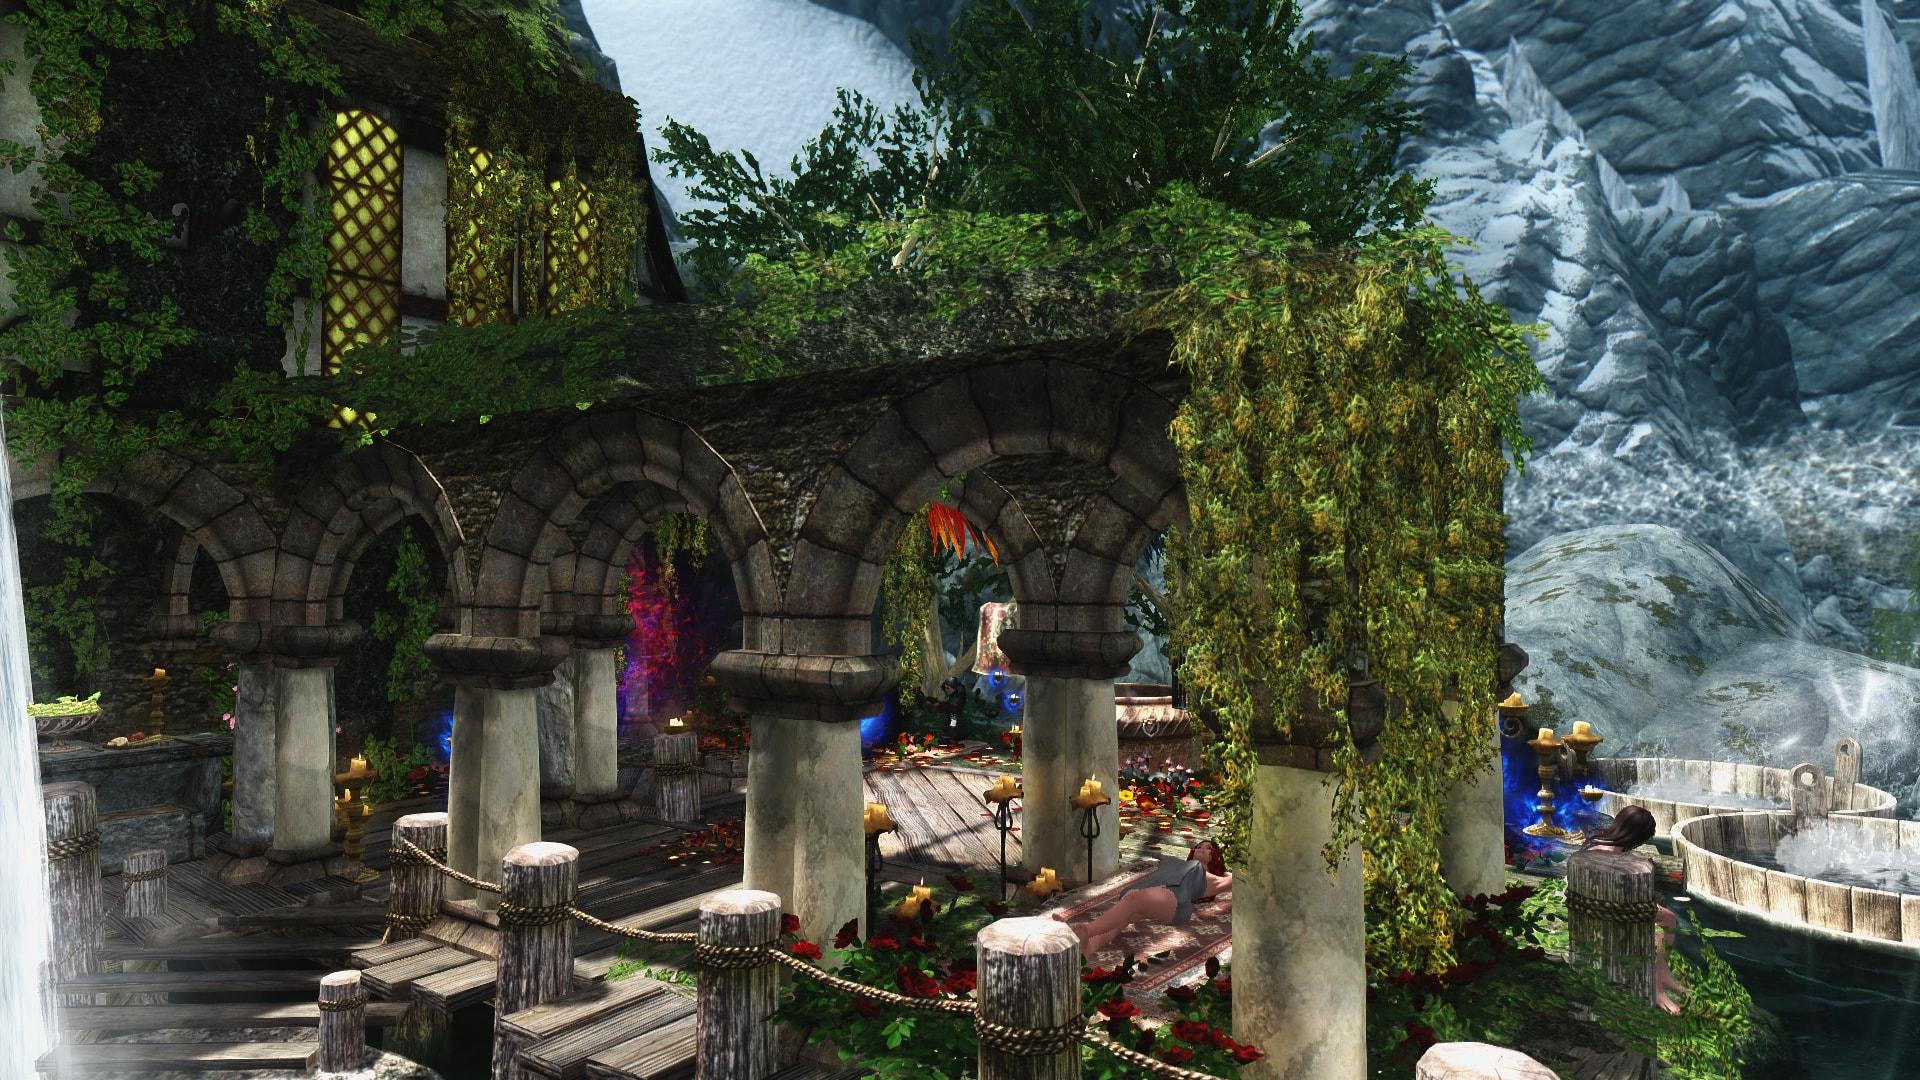 Deithwen - Witcher Inspired Home | Деитвен - большой дом для игрока